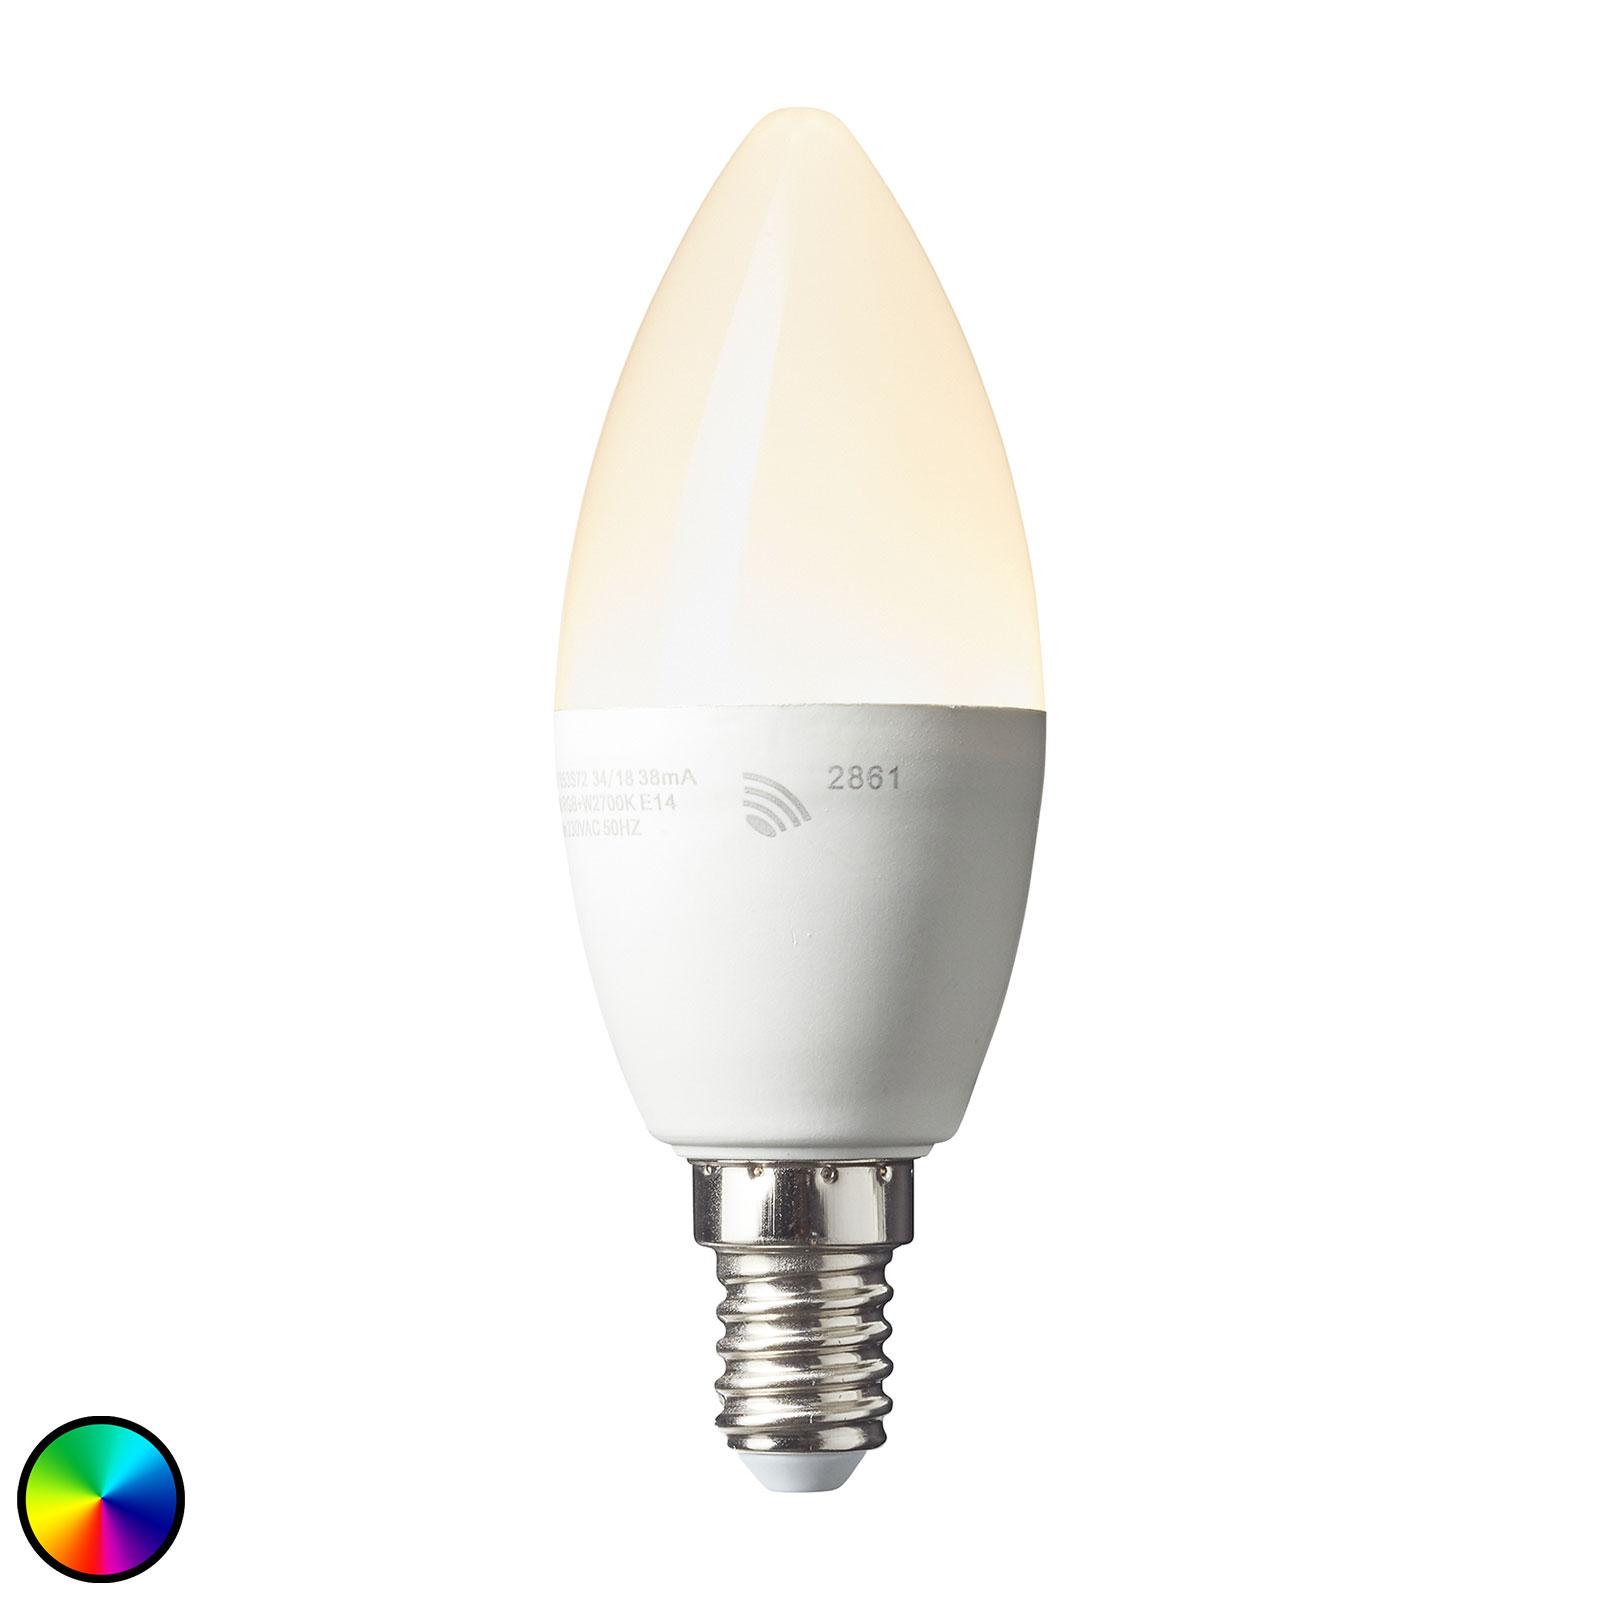 LED-kronljuslampa E14 4,5 W Smart-Tuya RGBW